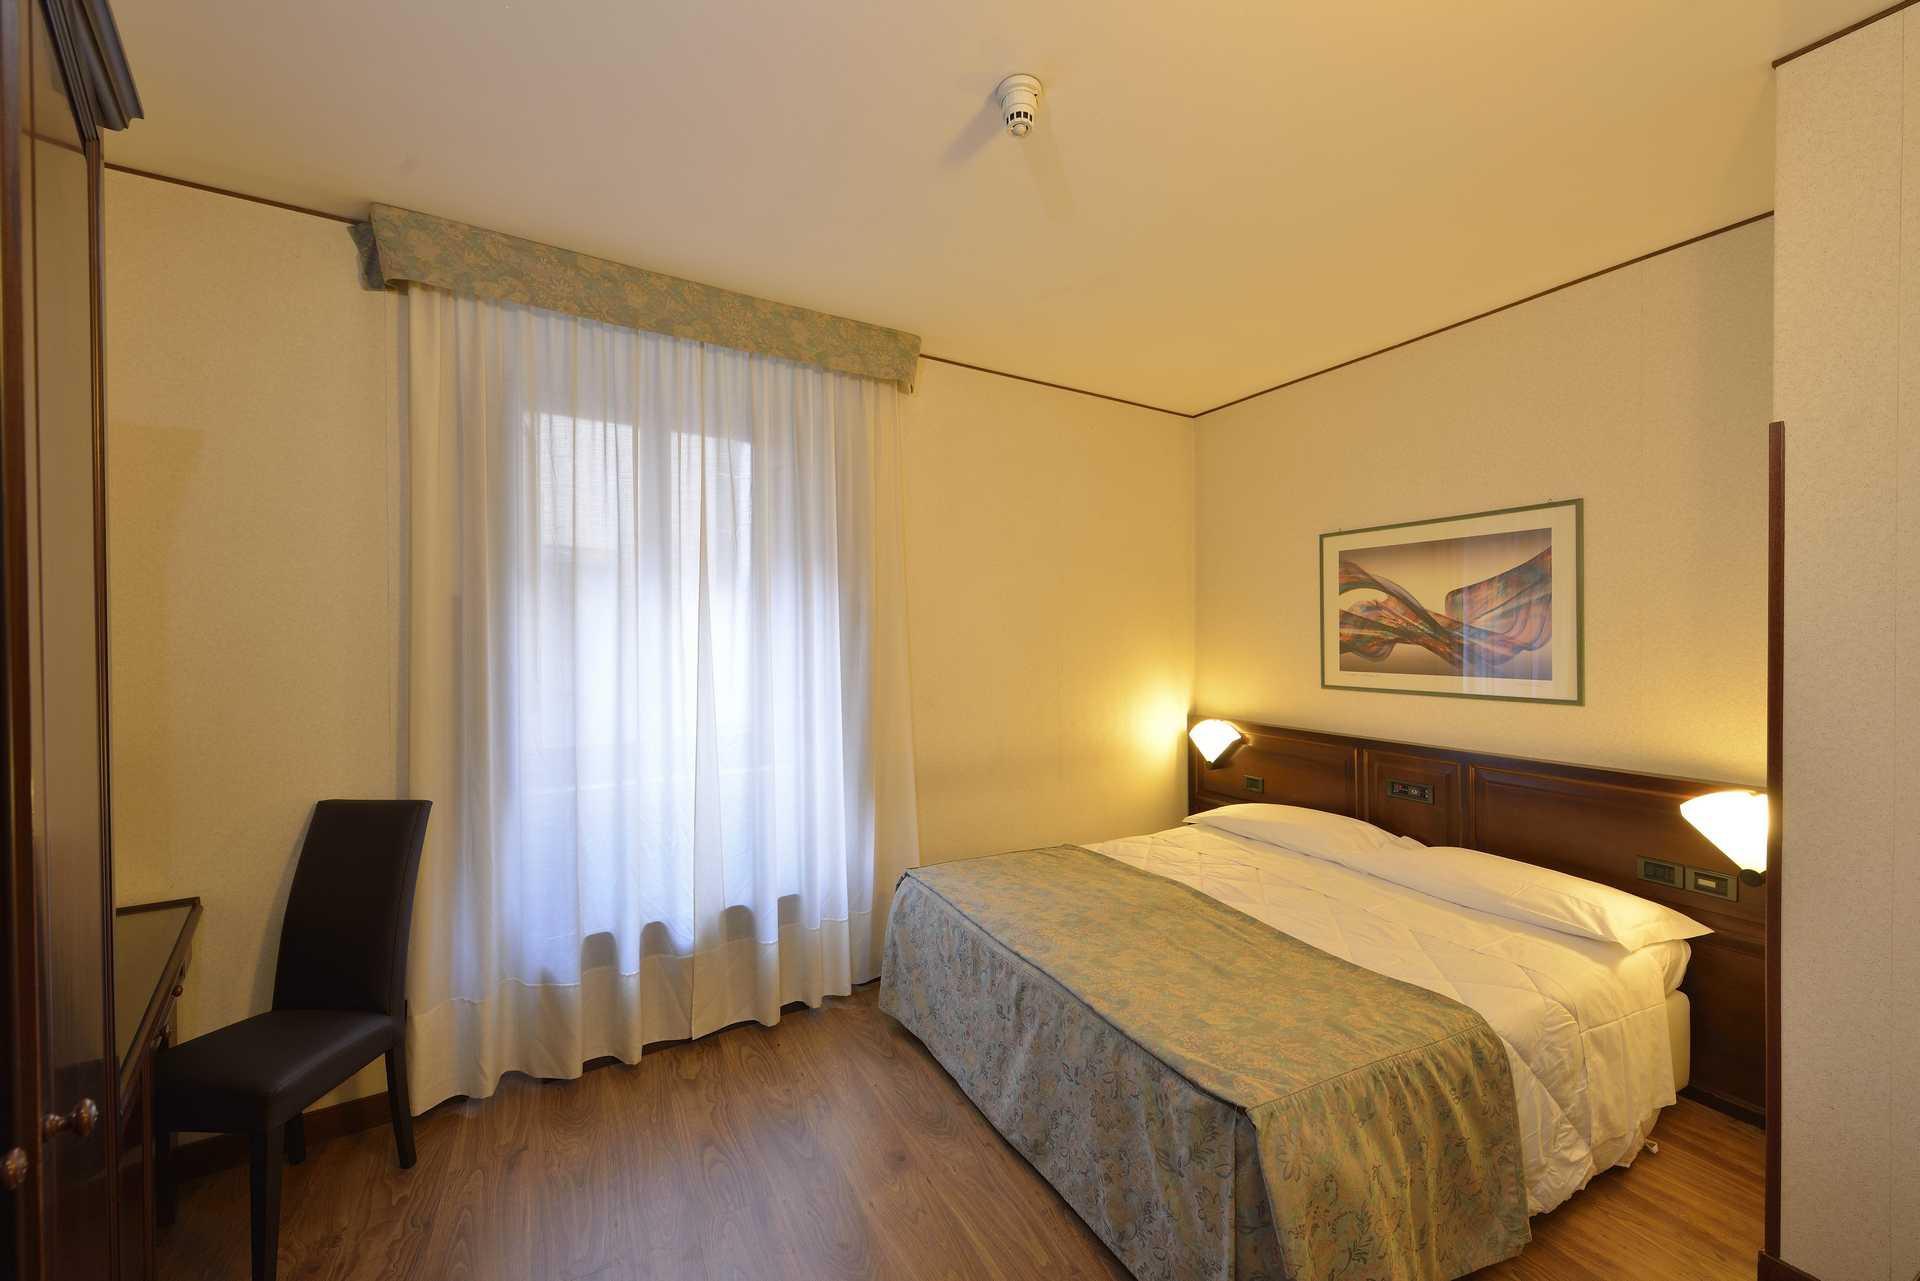 Camera economy - camera basic - Basic room - Hotel Fonte Cesia Todi